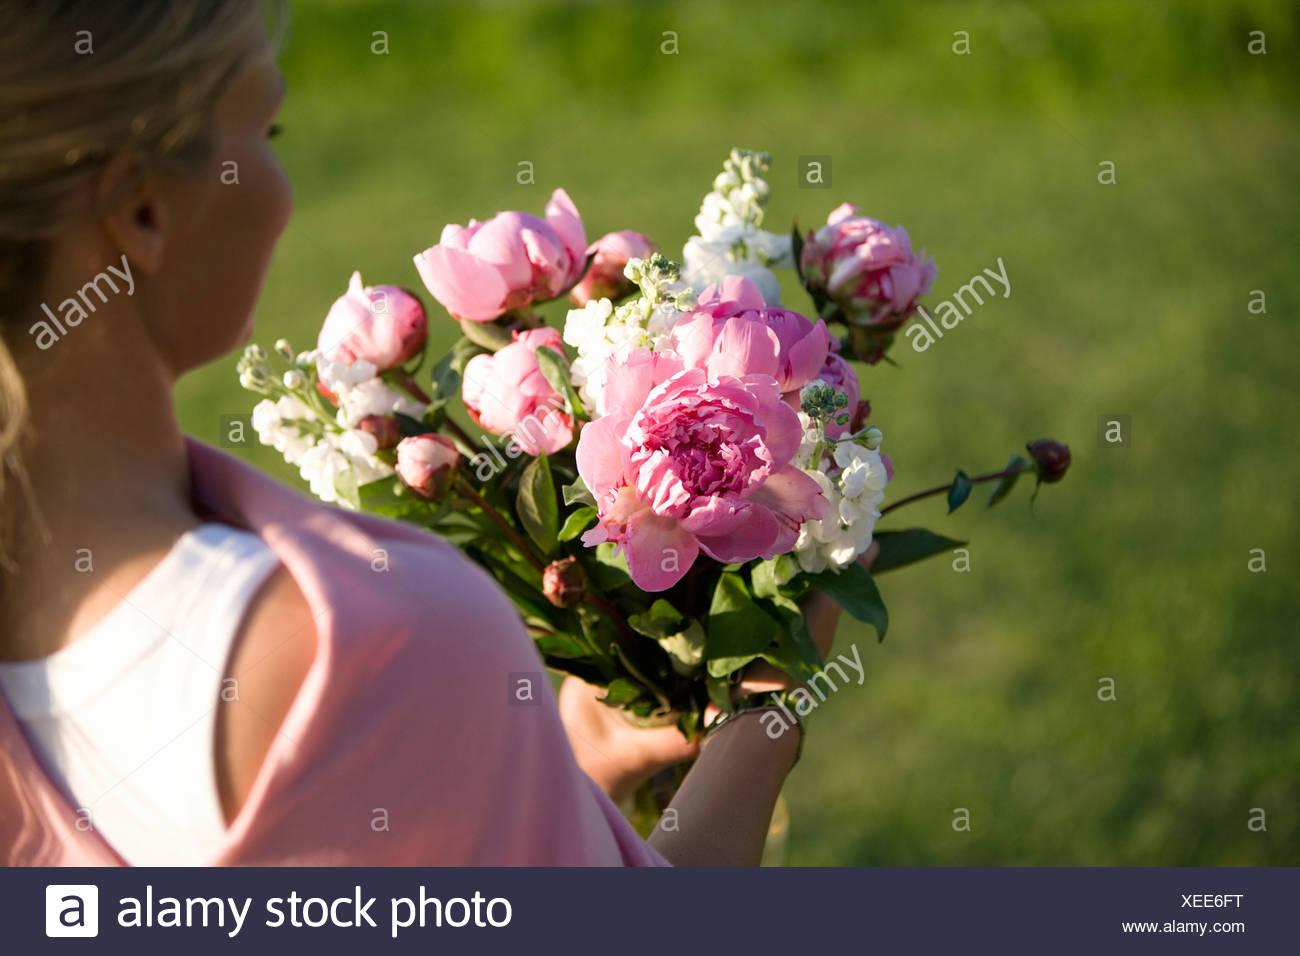 Woman carrying a bunch of flowers, Fejan, Stockholm archipelago, Sweden. Stock Photo